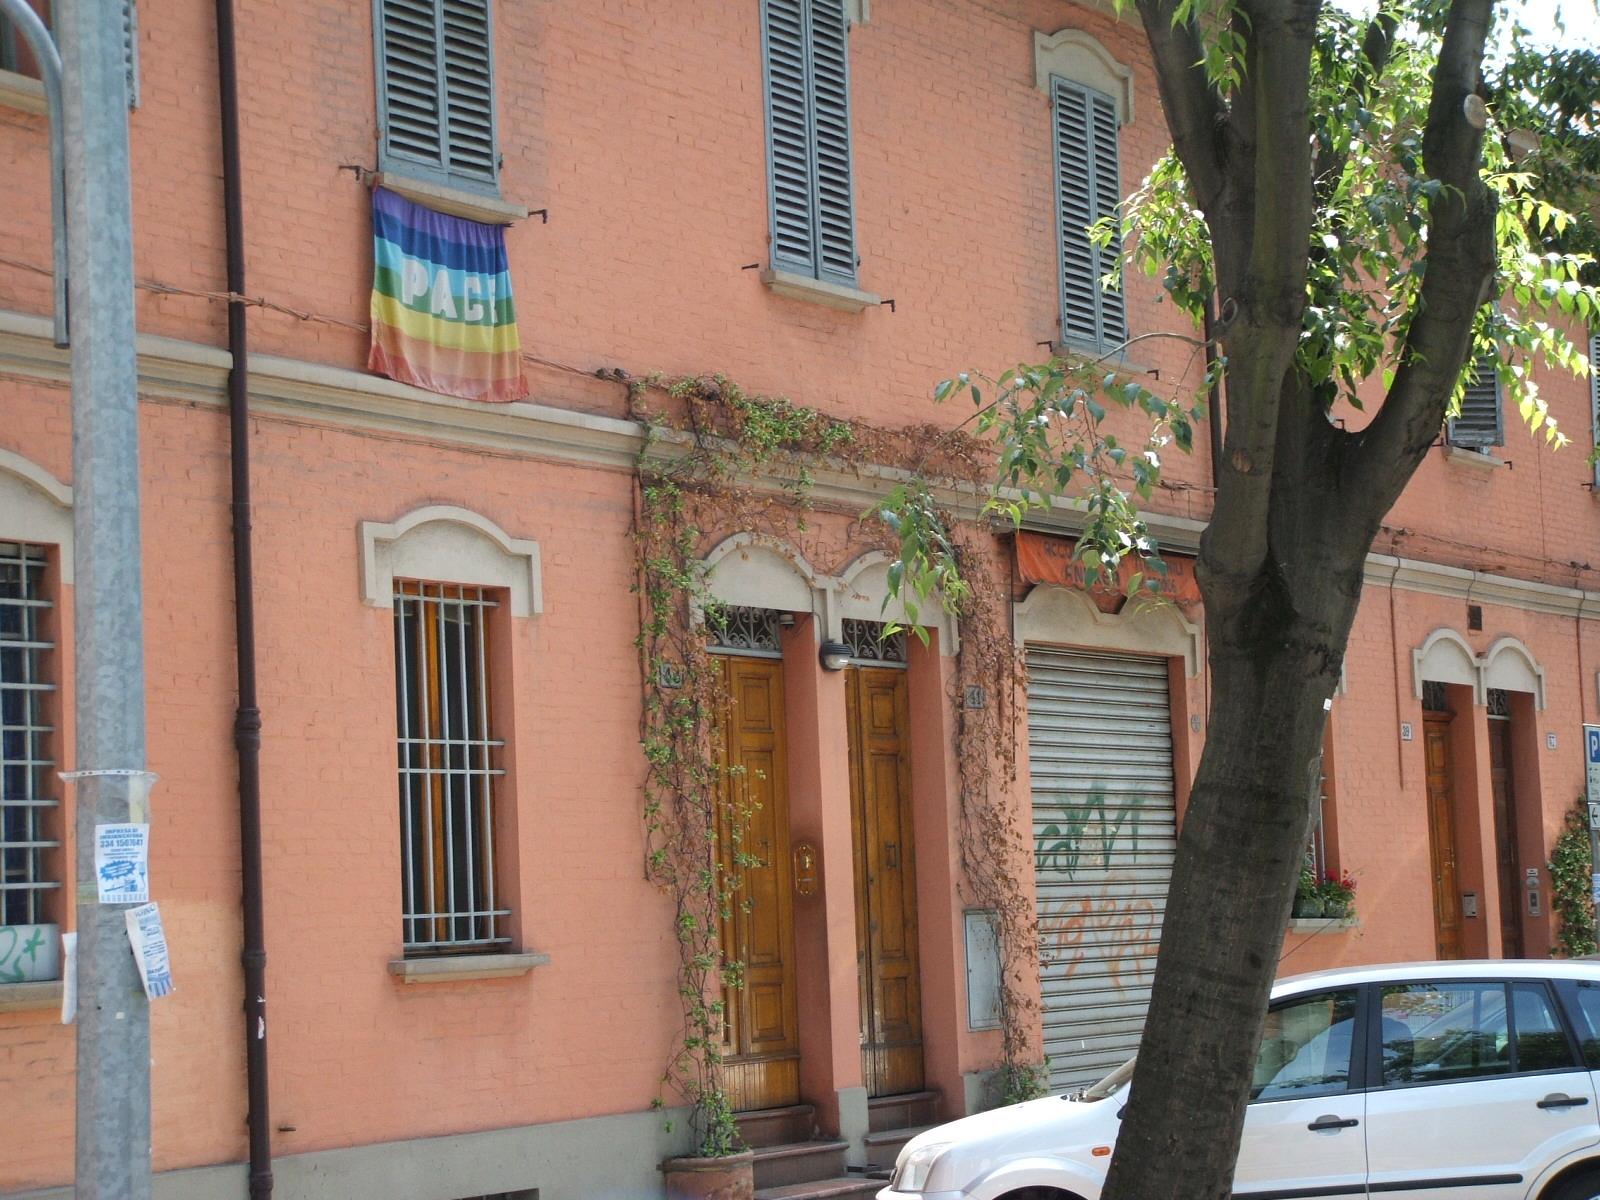 Via Paolo Fabbri, 43, Bologna.